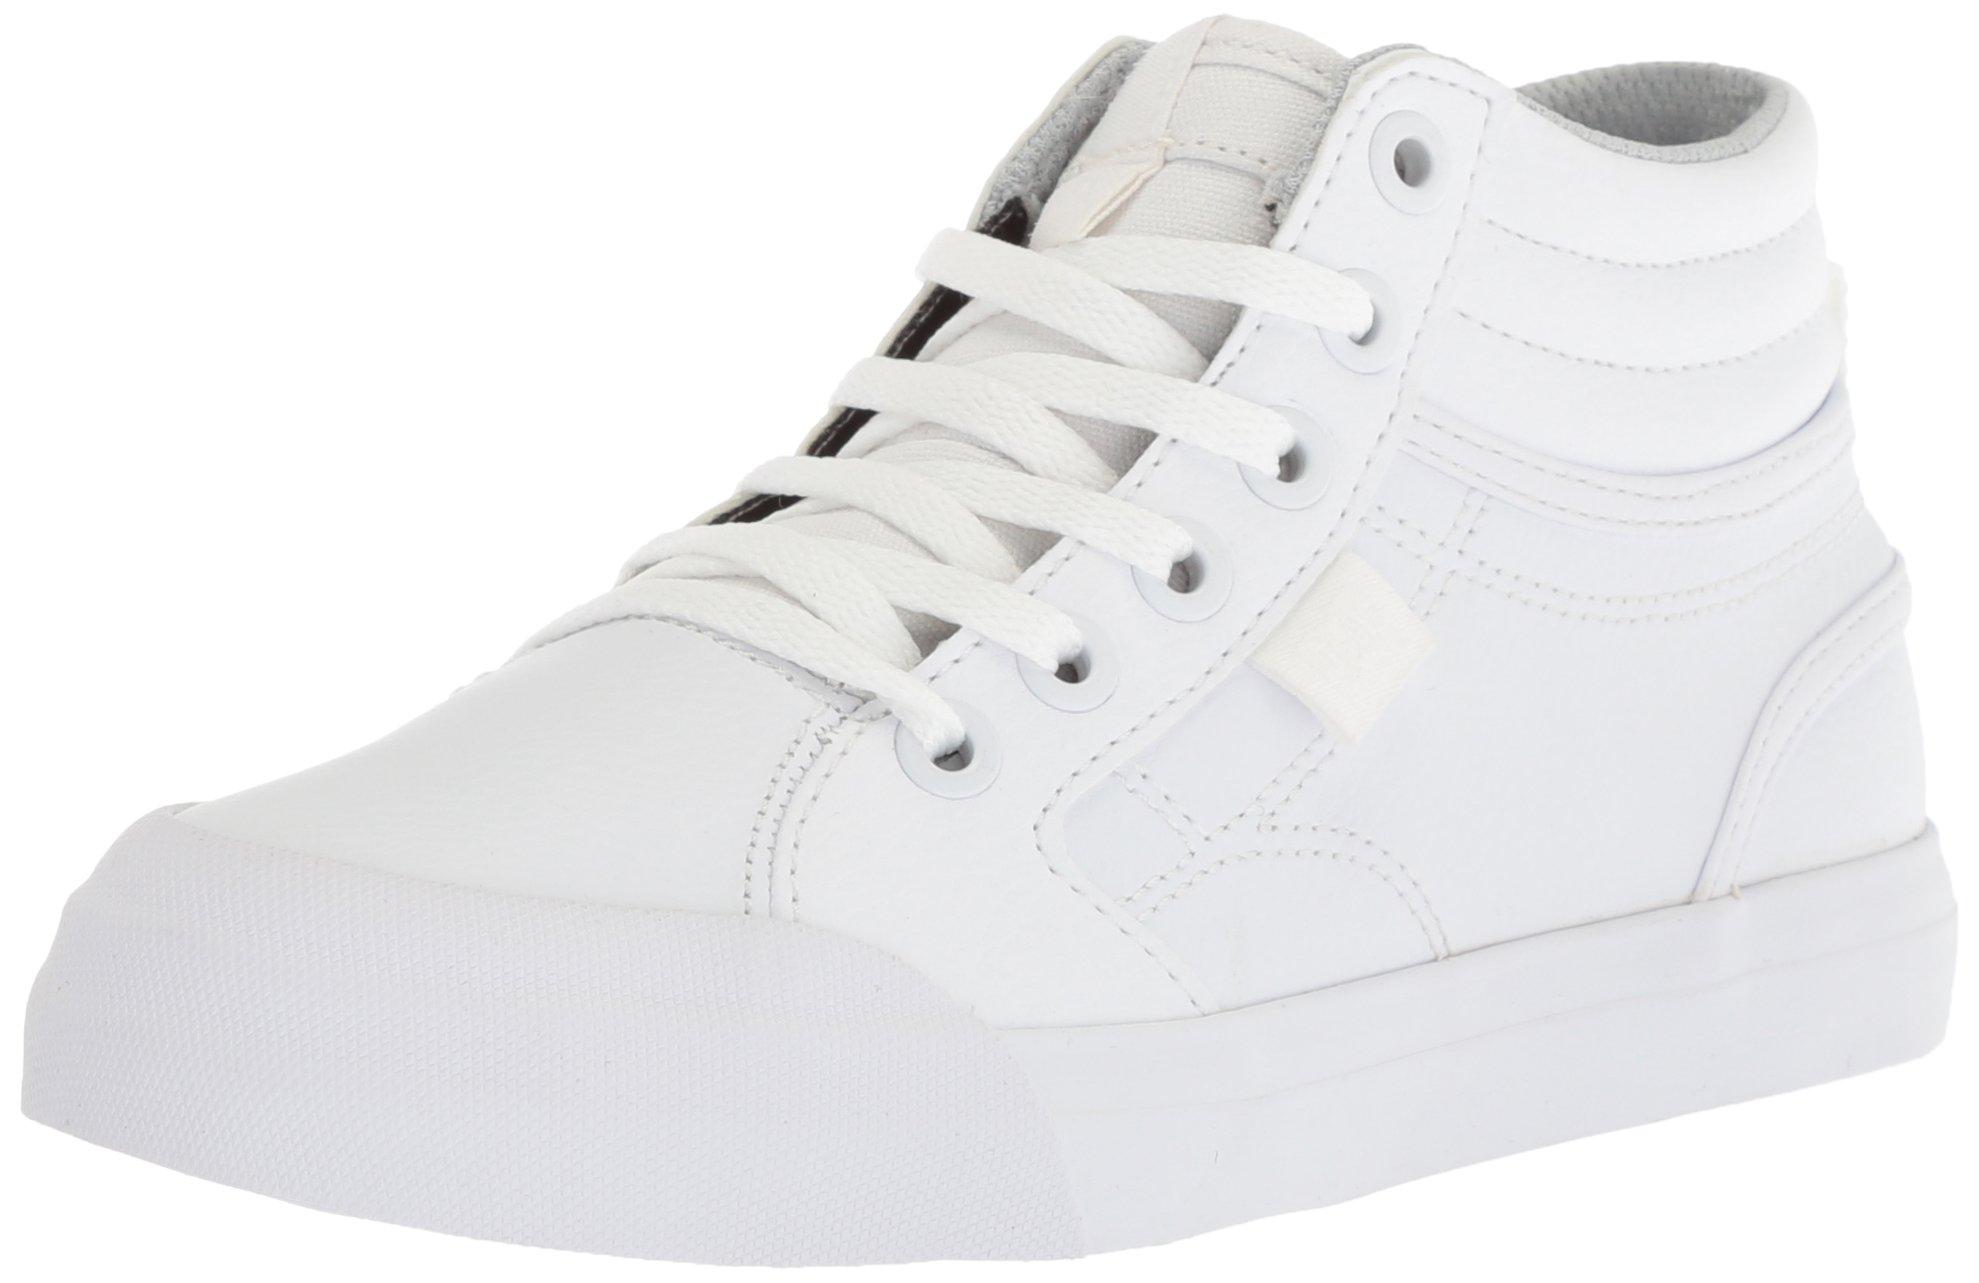 DC Boys Youth Evan Hi Skate Shoes, White 13.5 M US Little Kid